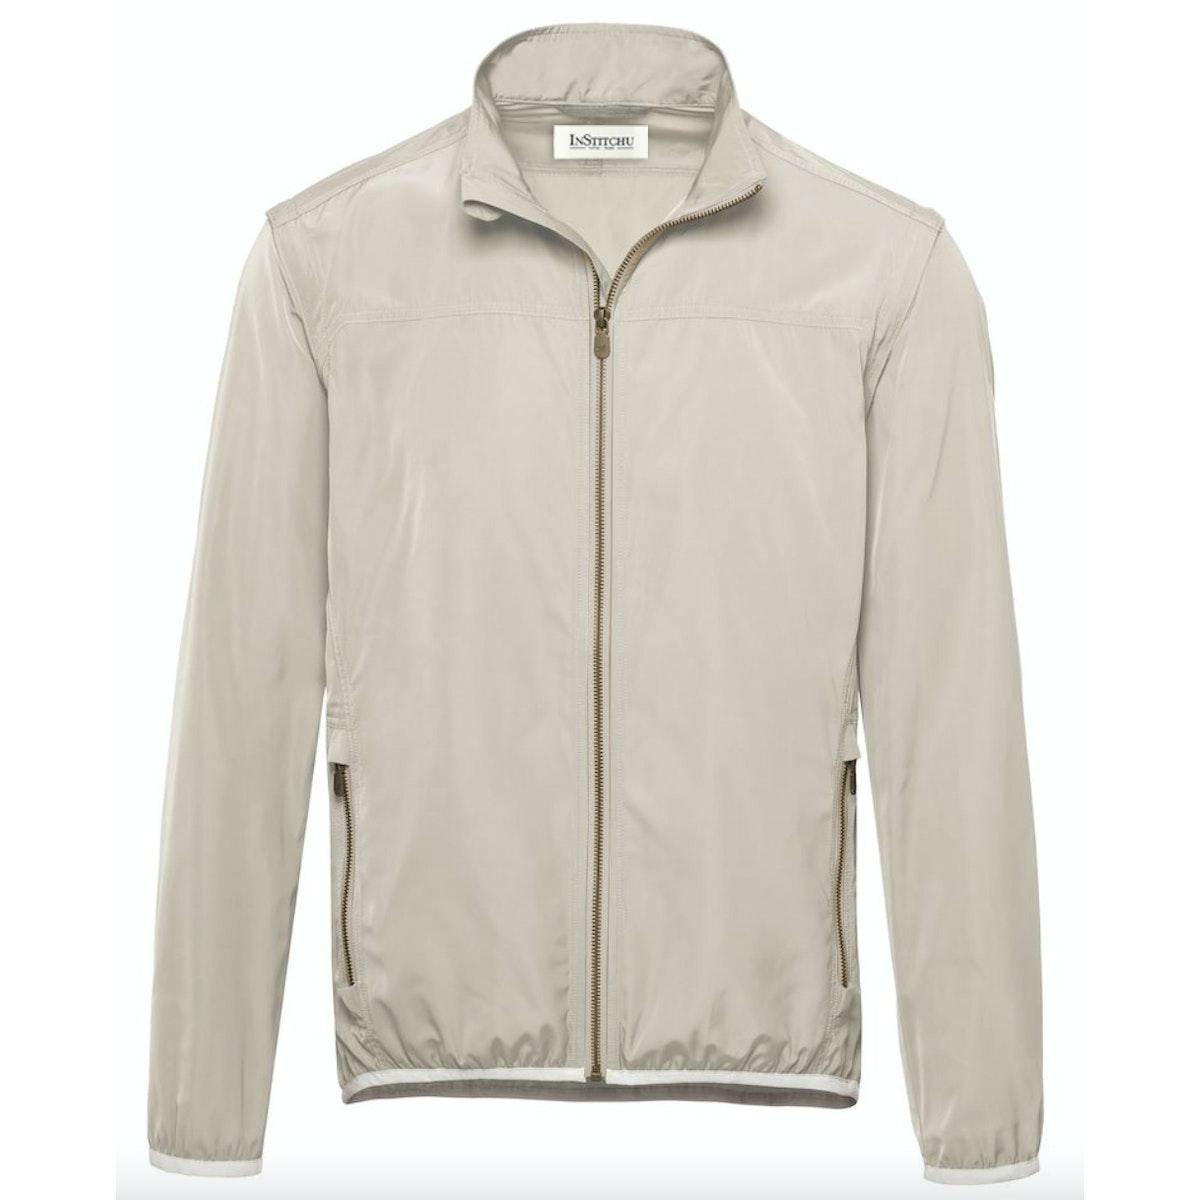 The Woods Sand Golf Jacket